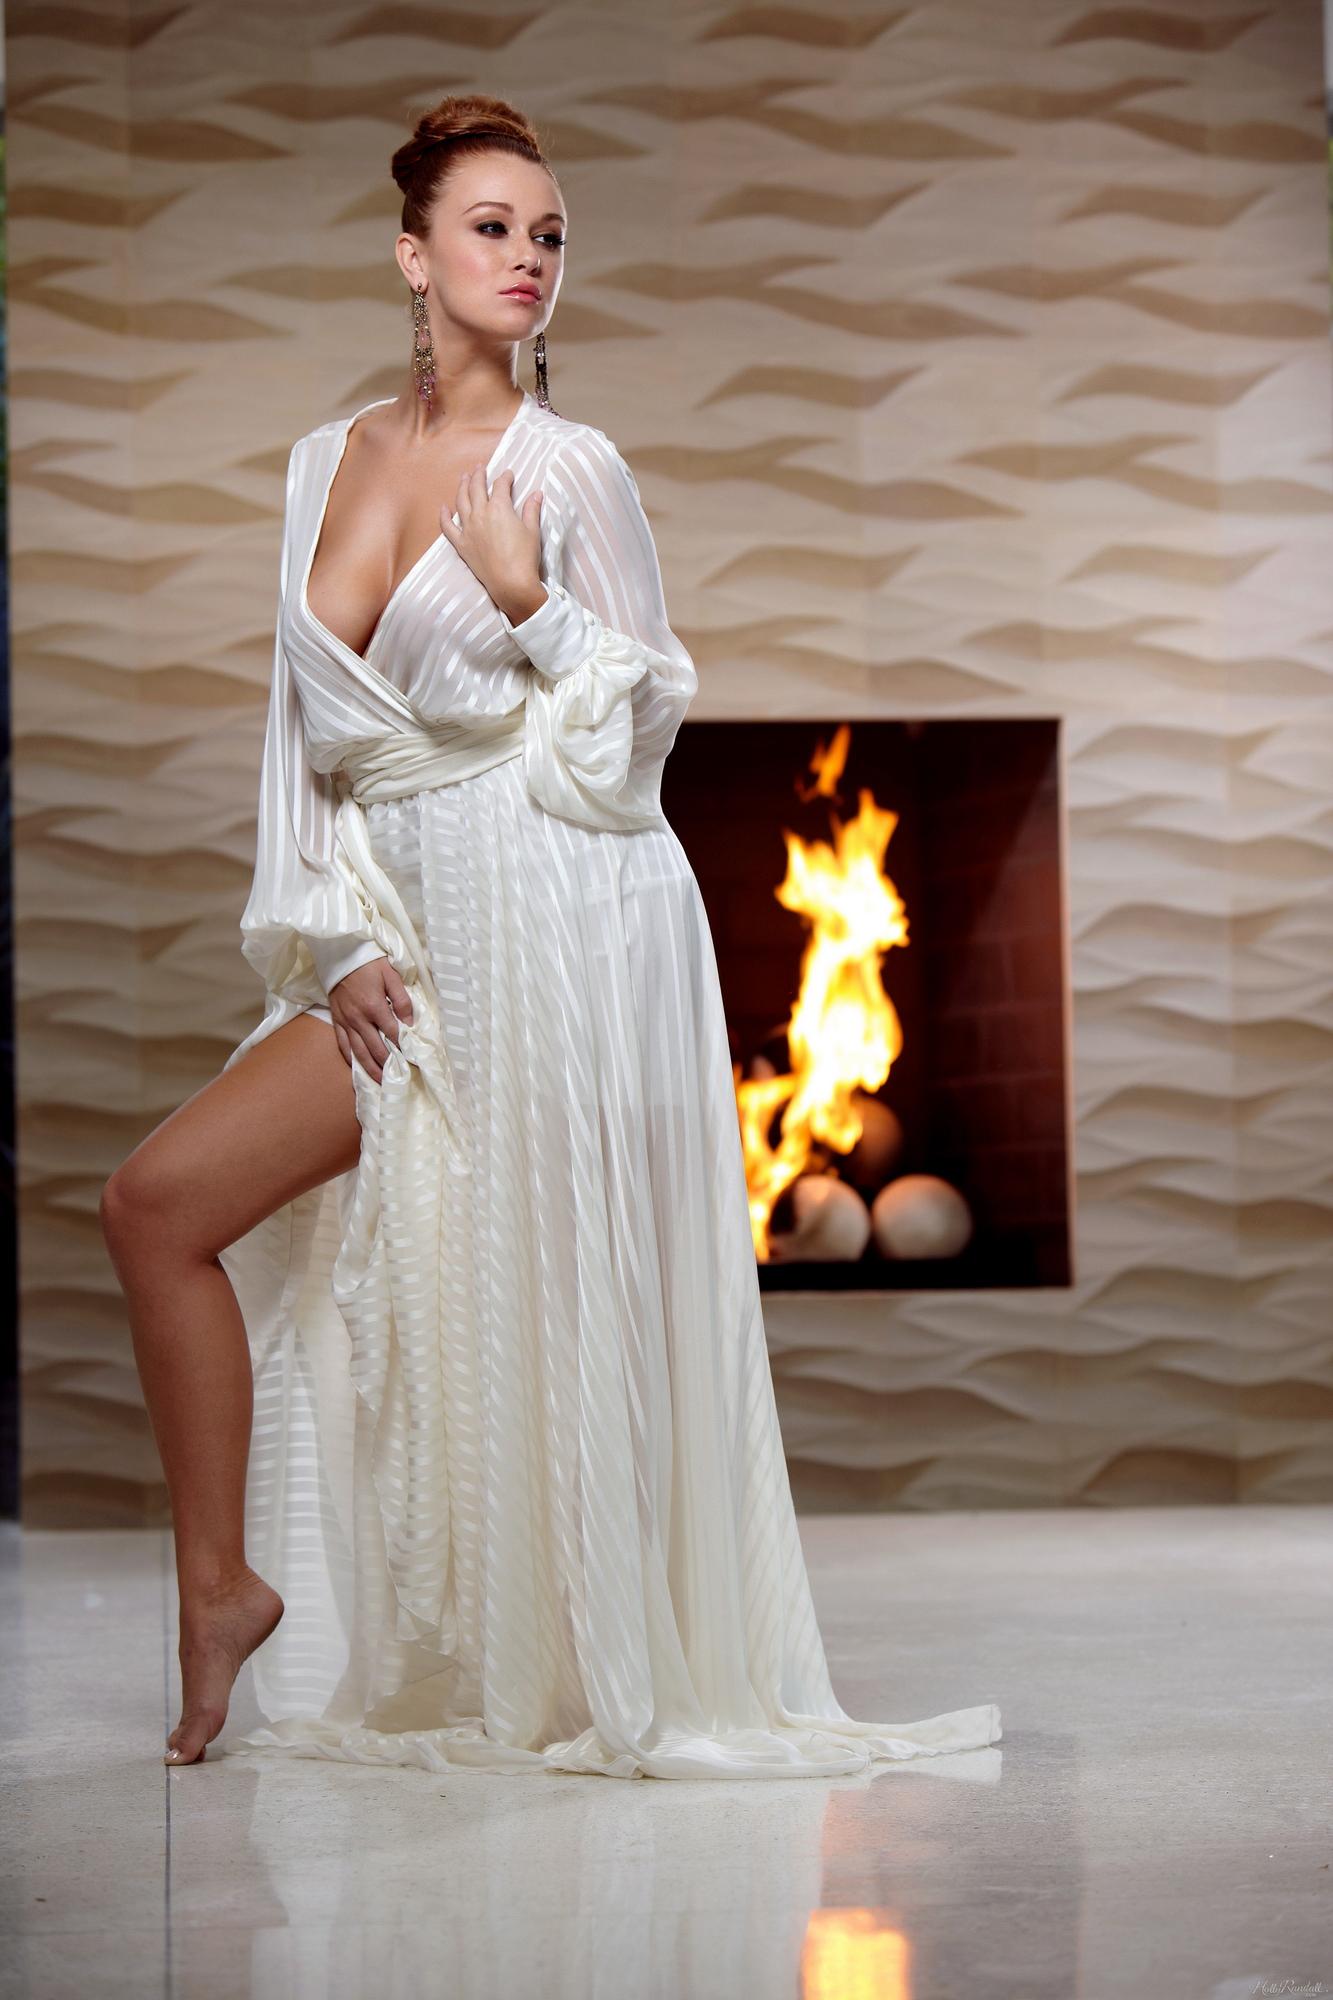 leanna-decker-nude-fireplace-redhead-hollyrandall-02